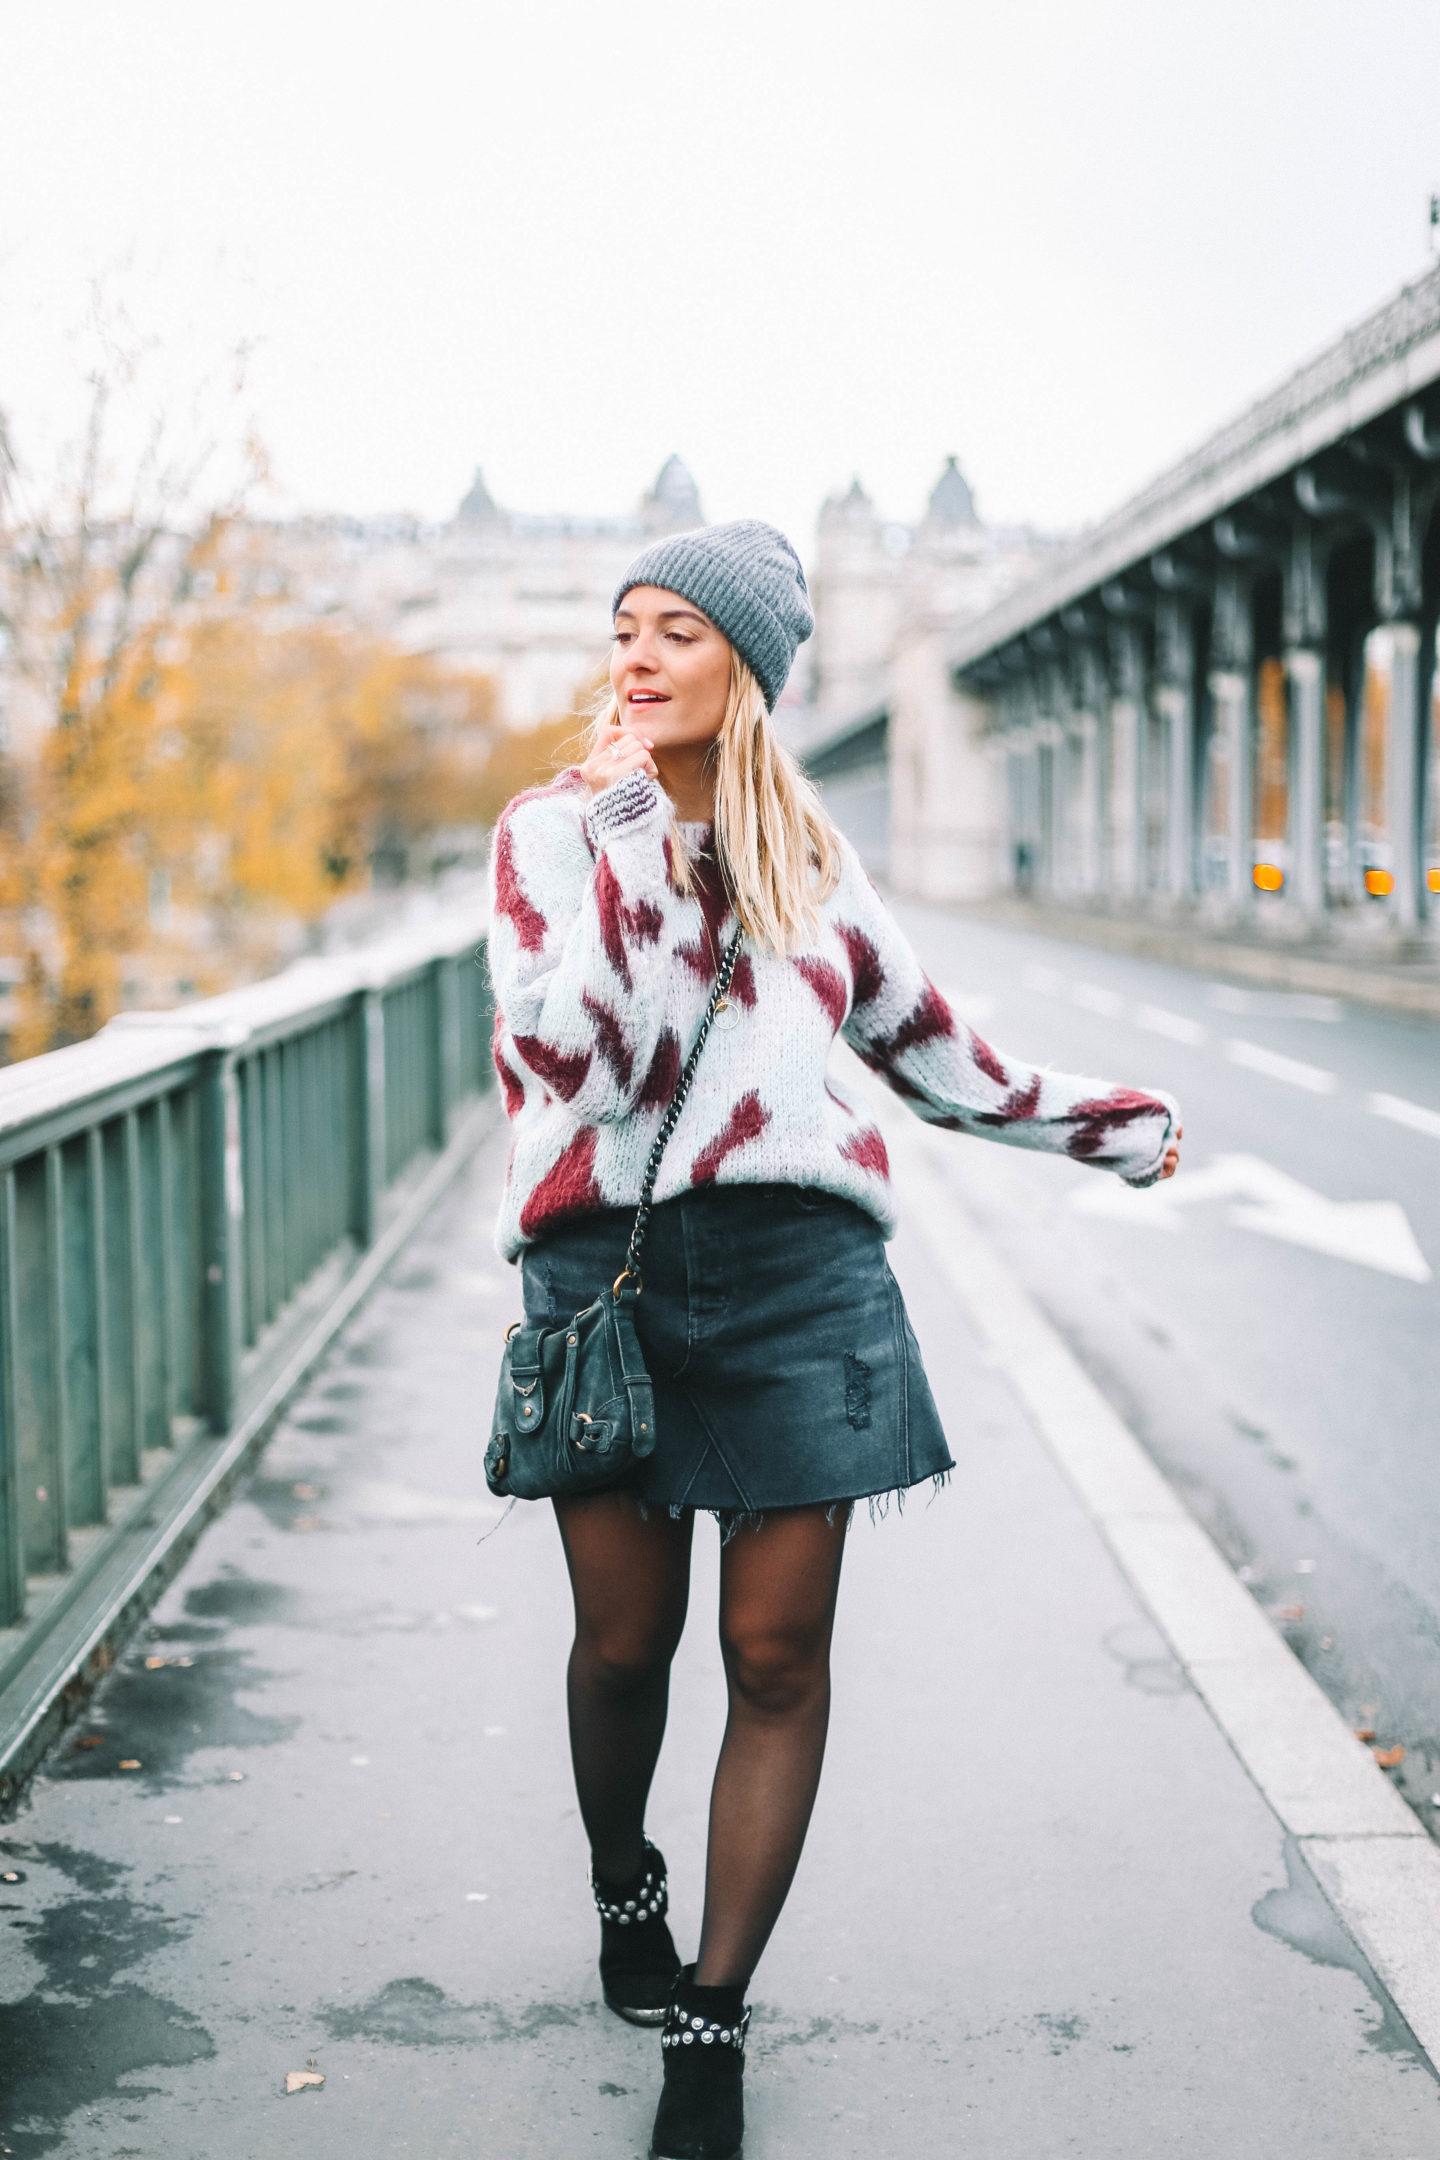 Pont de Bir Hakeim - Blondie baby blog mode et voyages